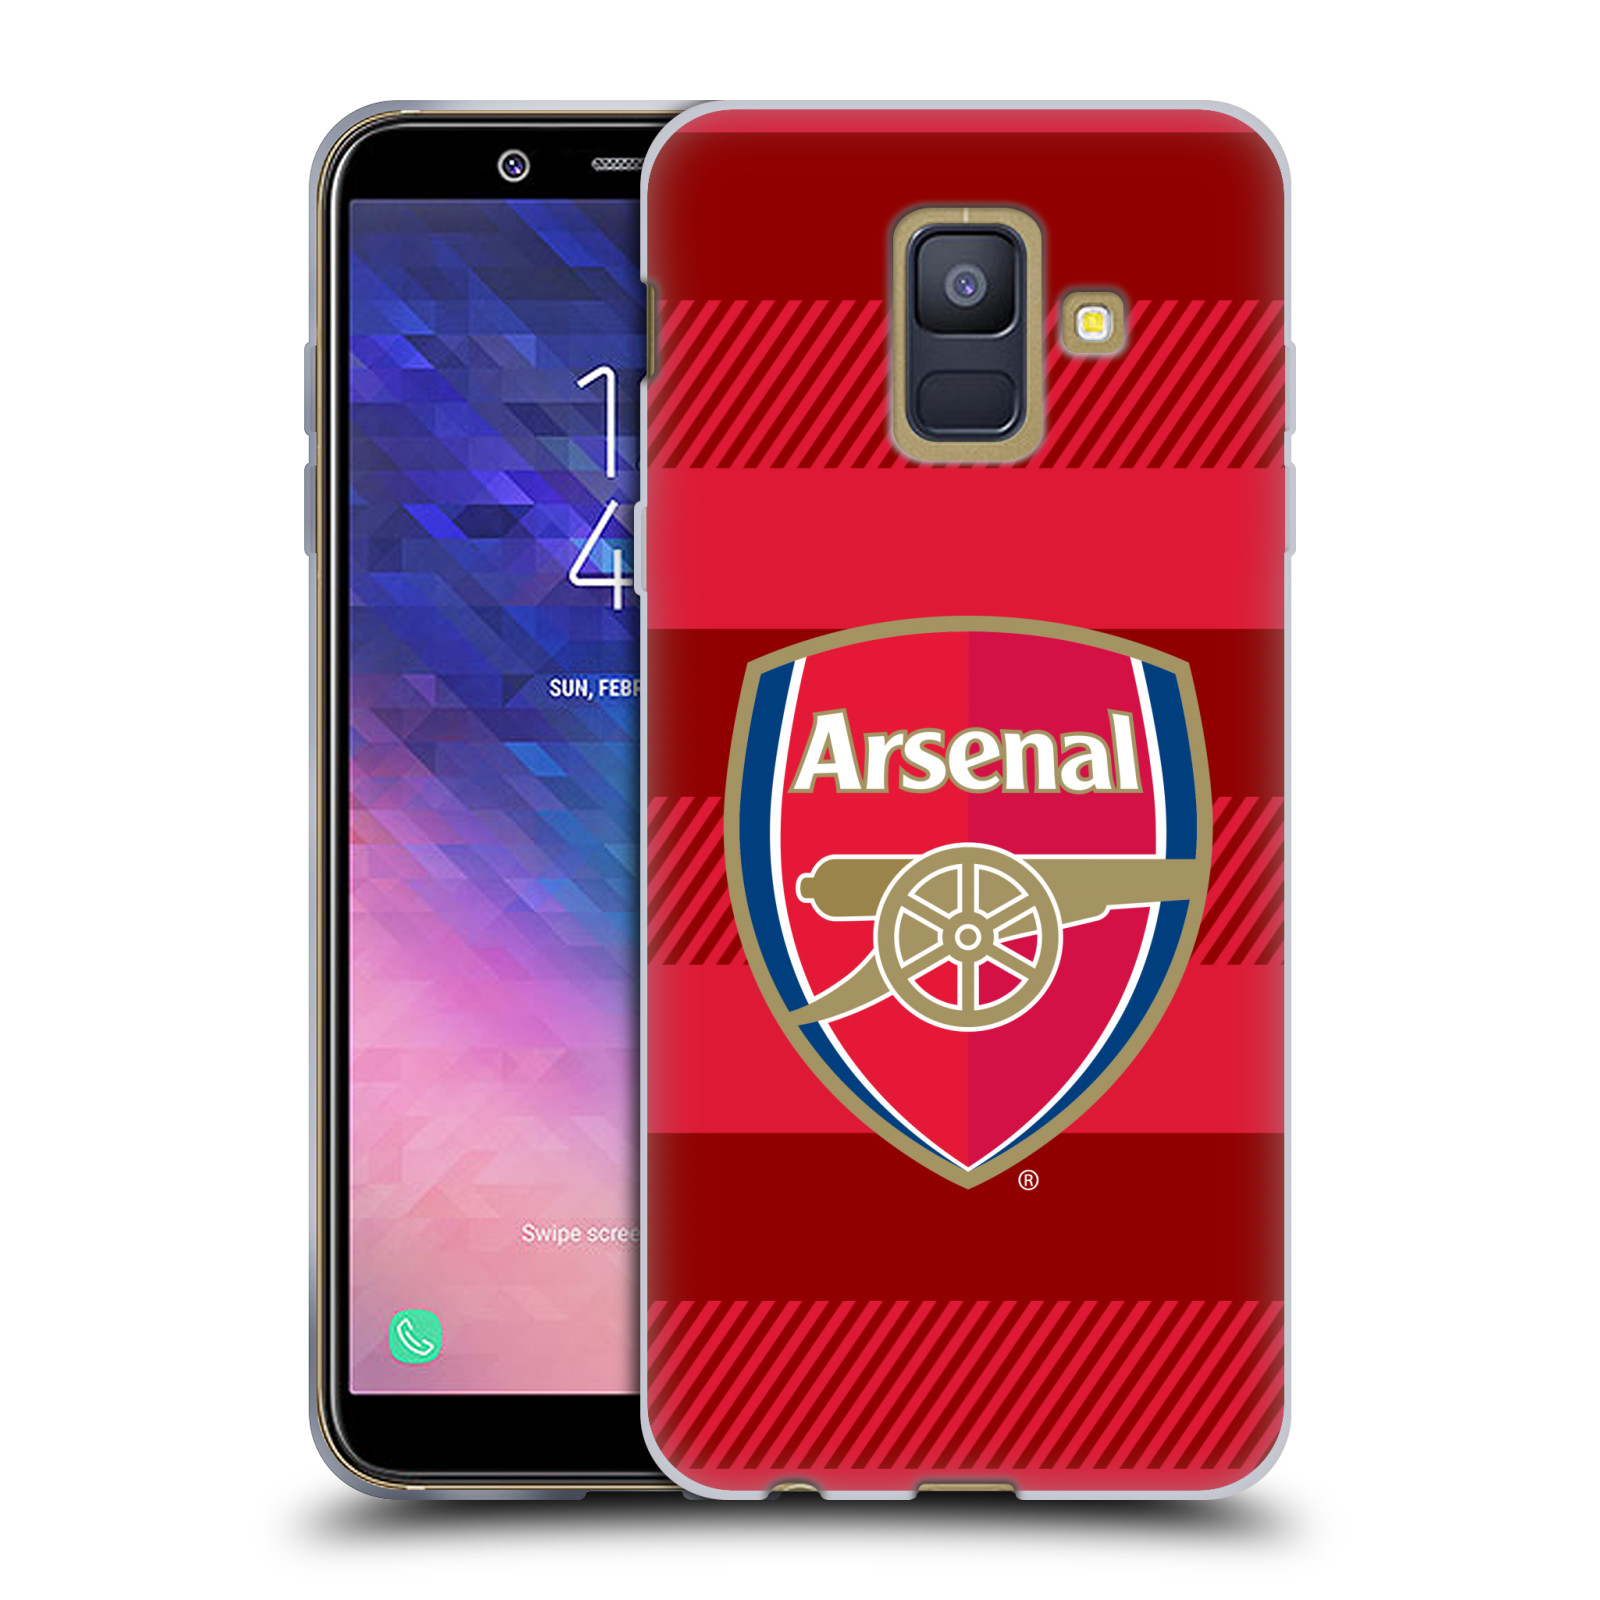 Silikonové pouzdro na mobil Samsung Galaxy A6 (2018) - Head Case - Arsenal FC - Logo s pruhy